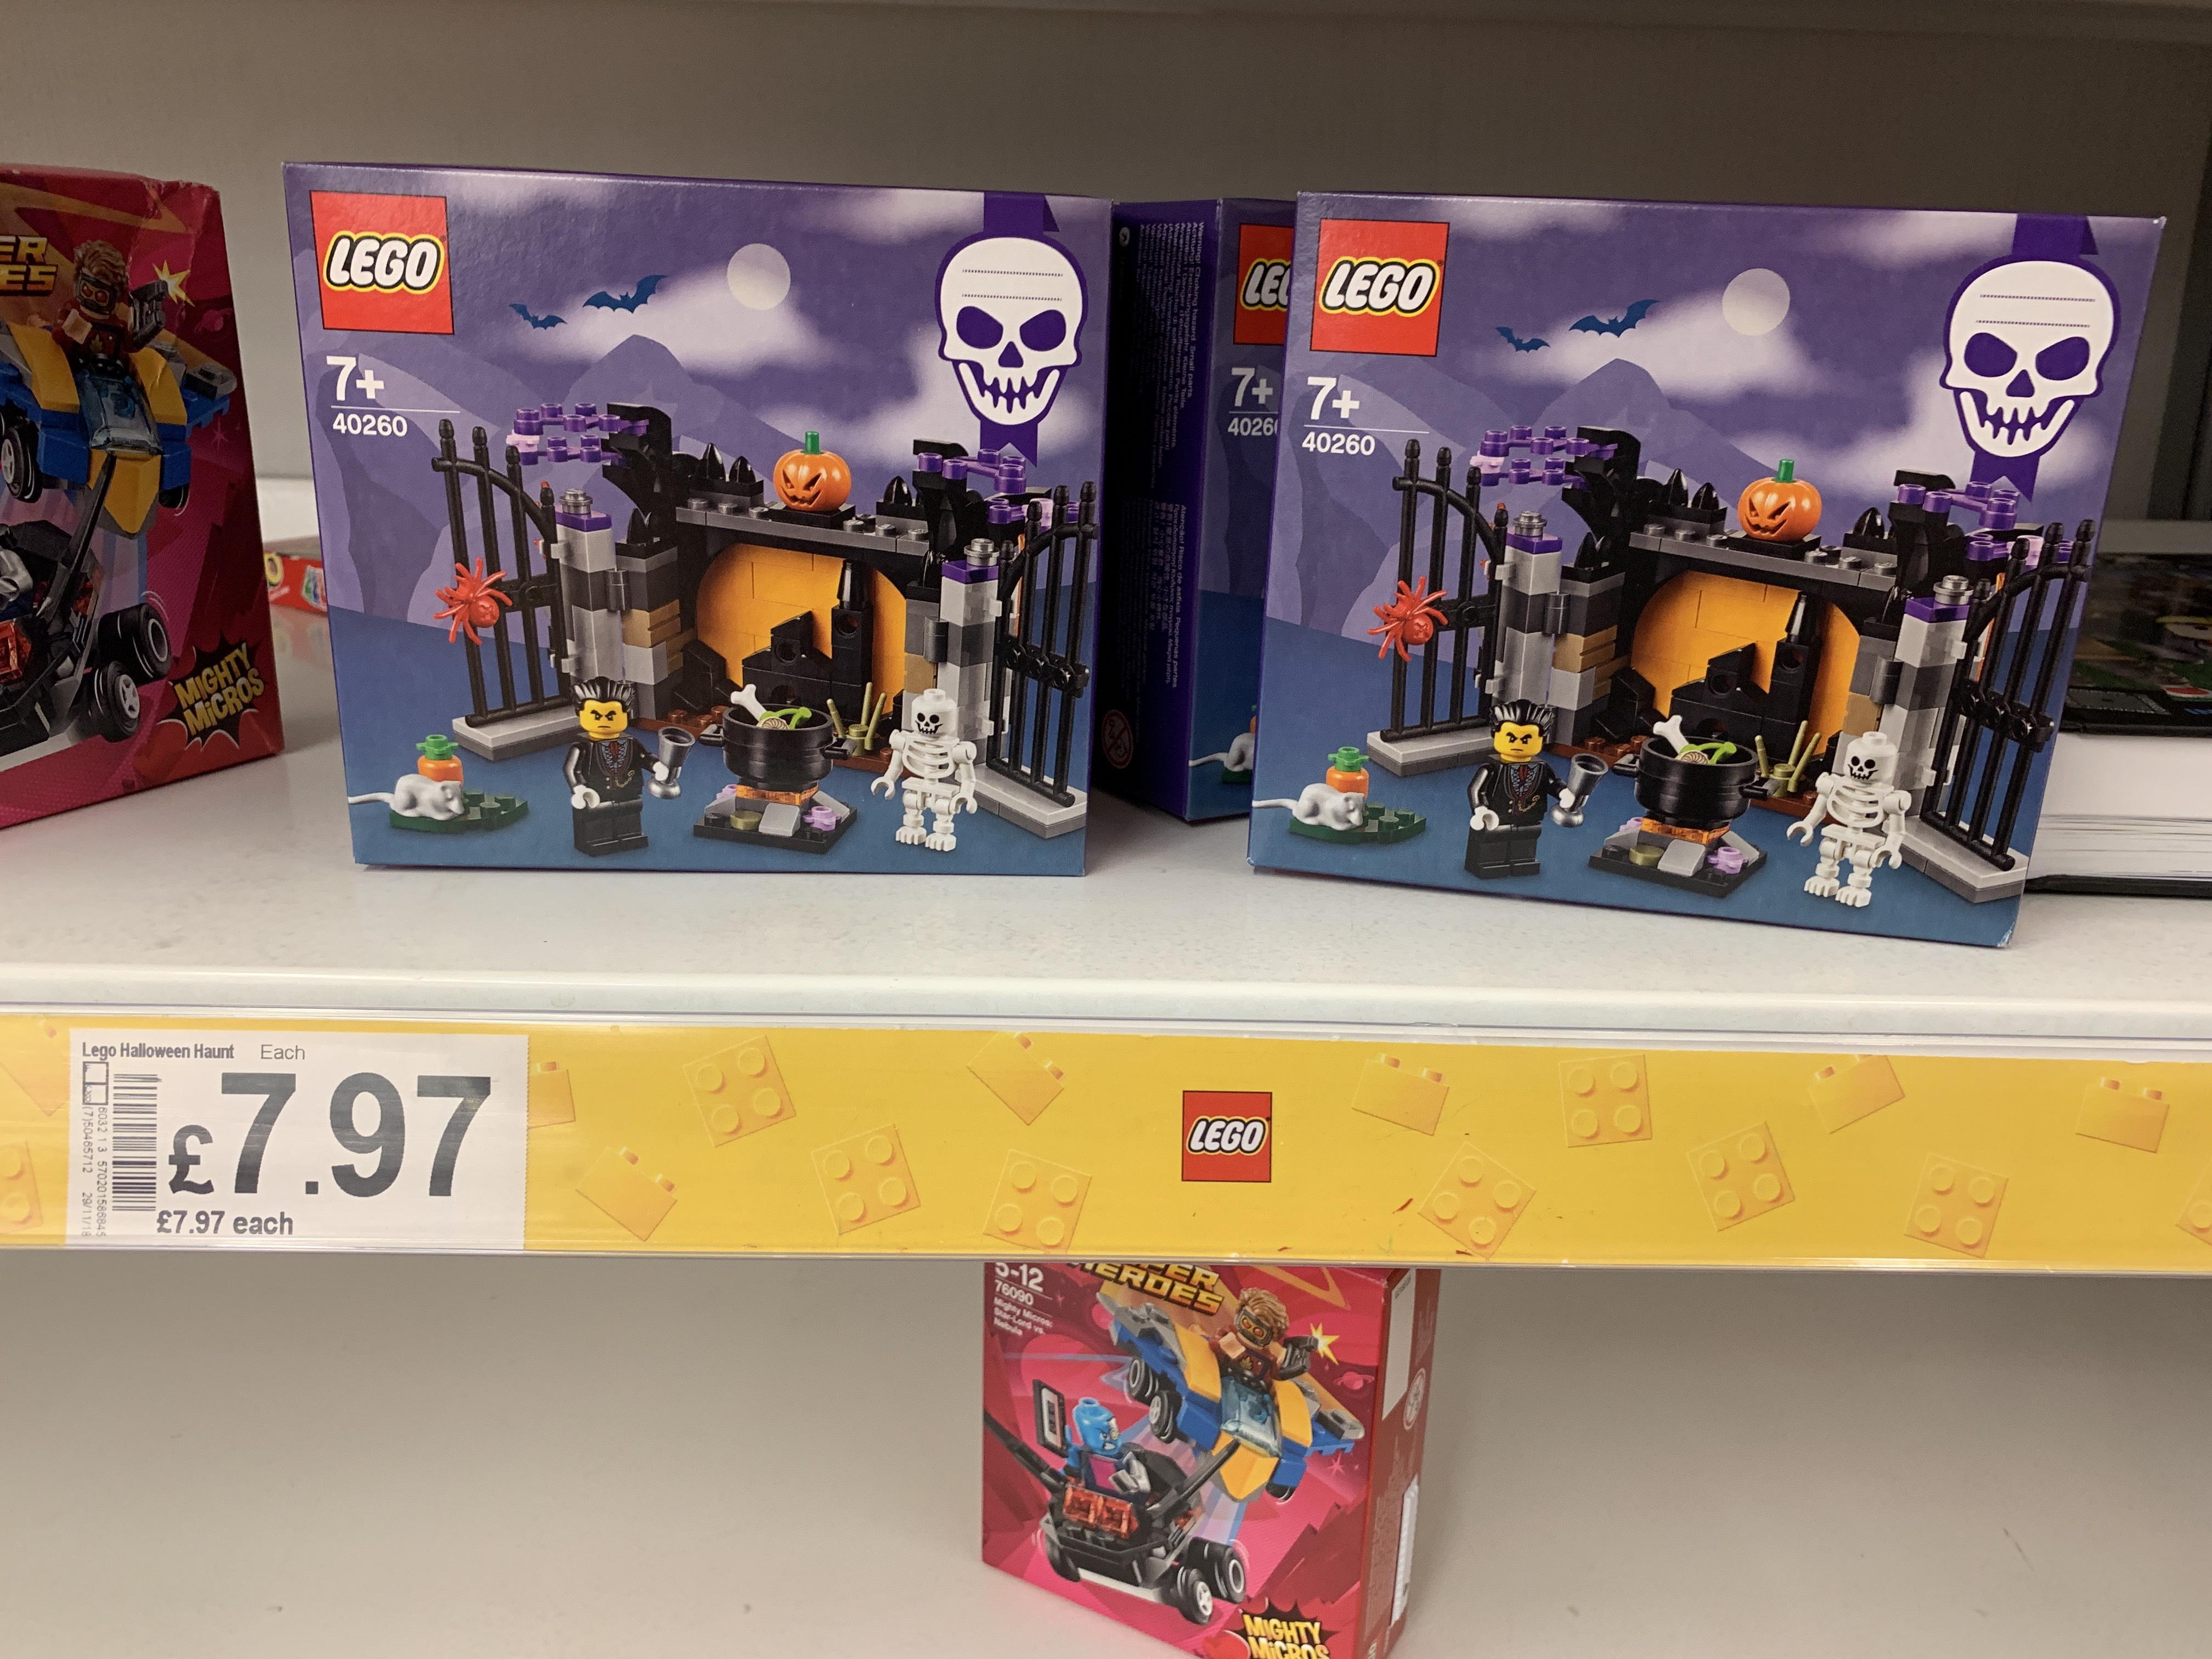 Lego Halloween Haunt 40260 £7.97 @ Asda lakeside